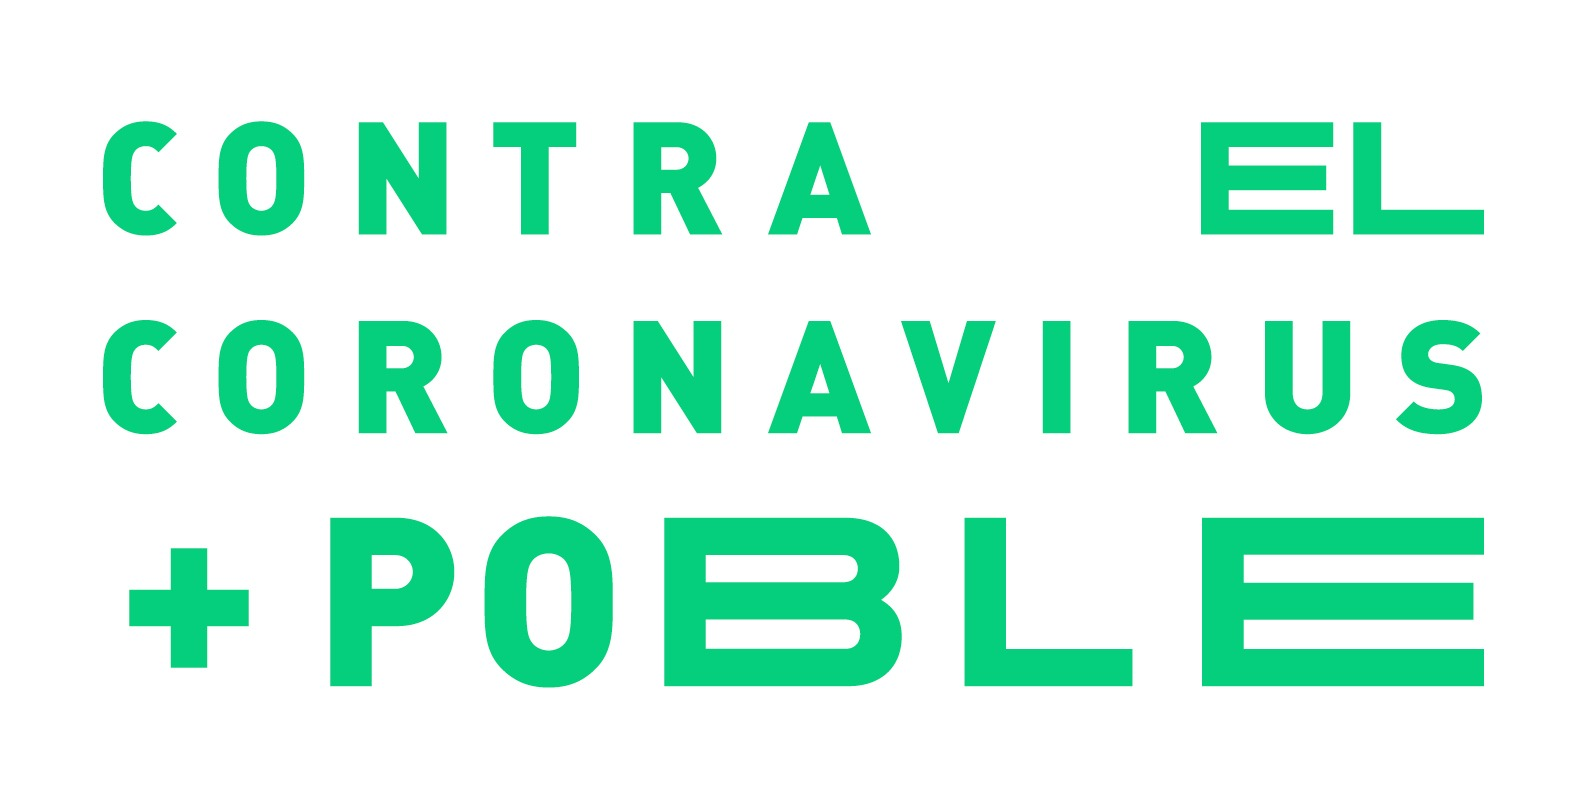 coronavirus mes poble verd